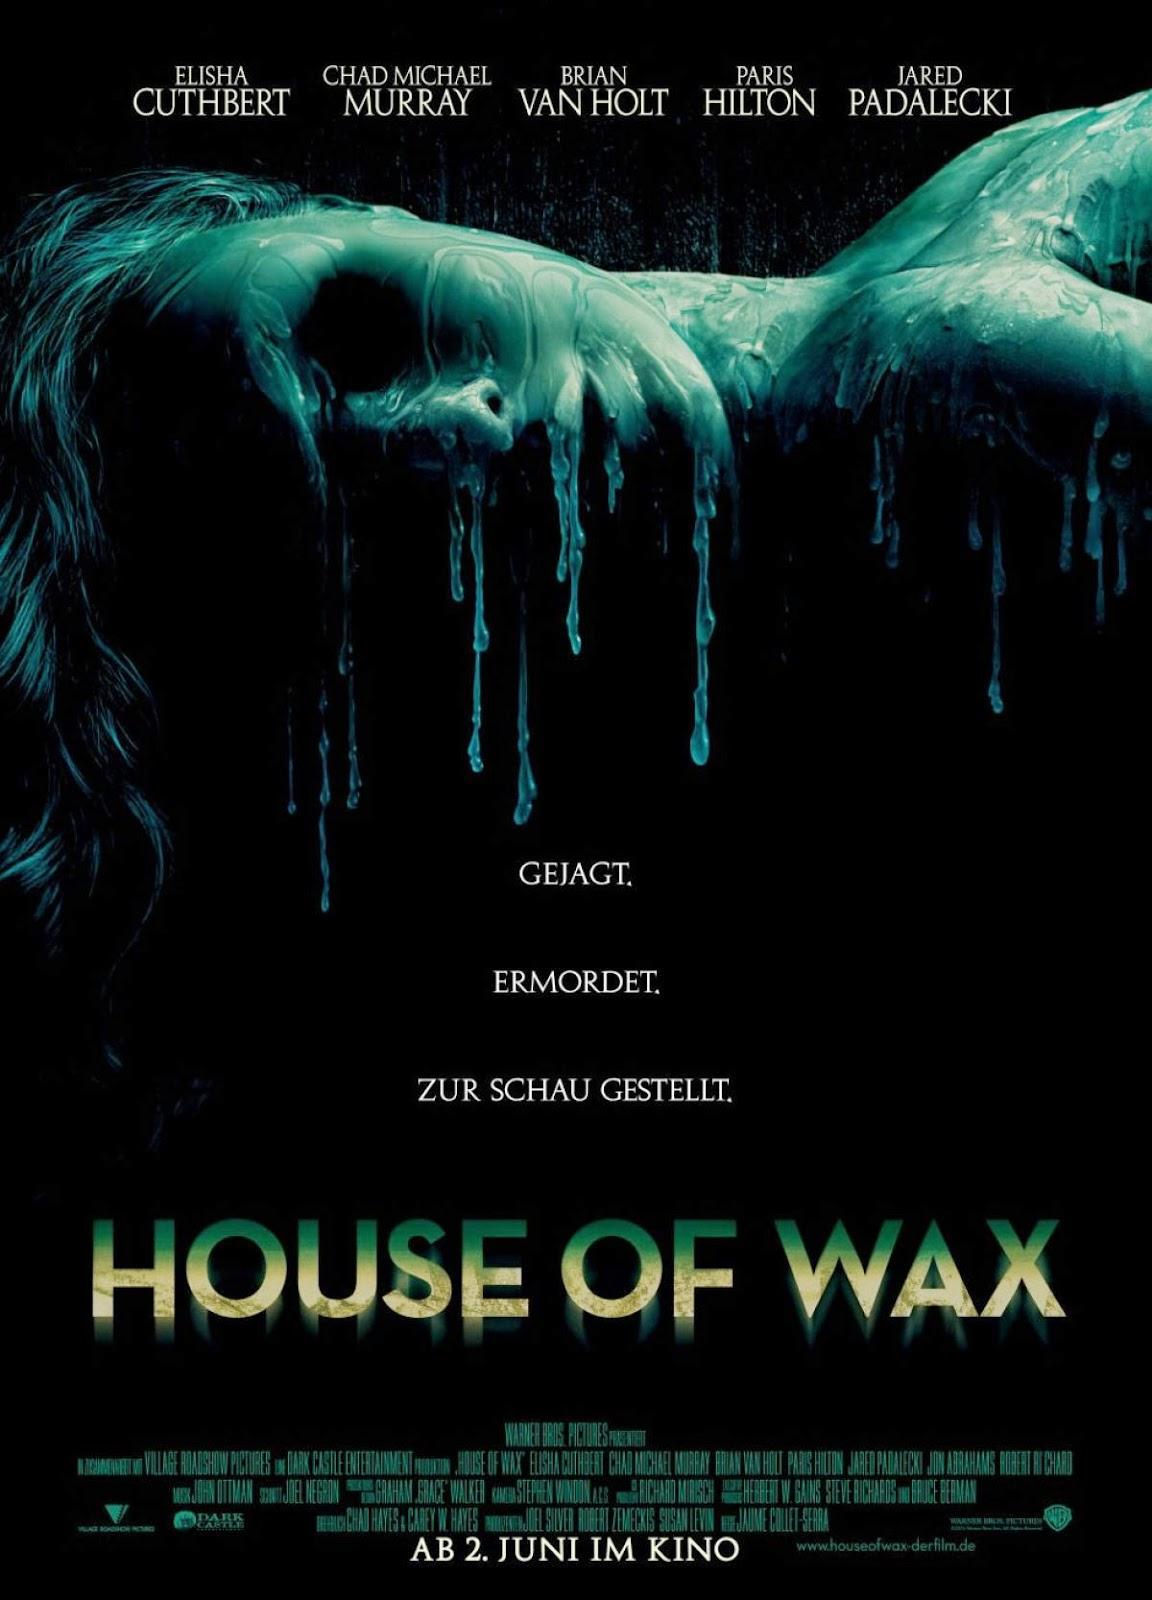 House of Wax บ้านหุ่นผี [HD][พากย์ไทย]